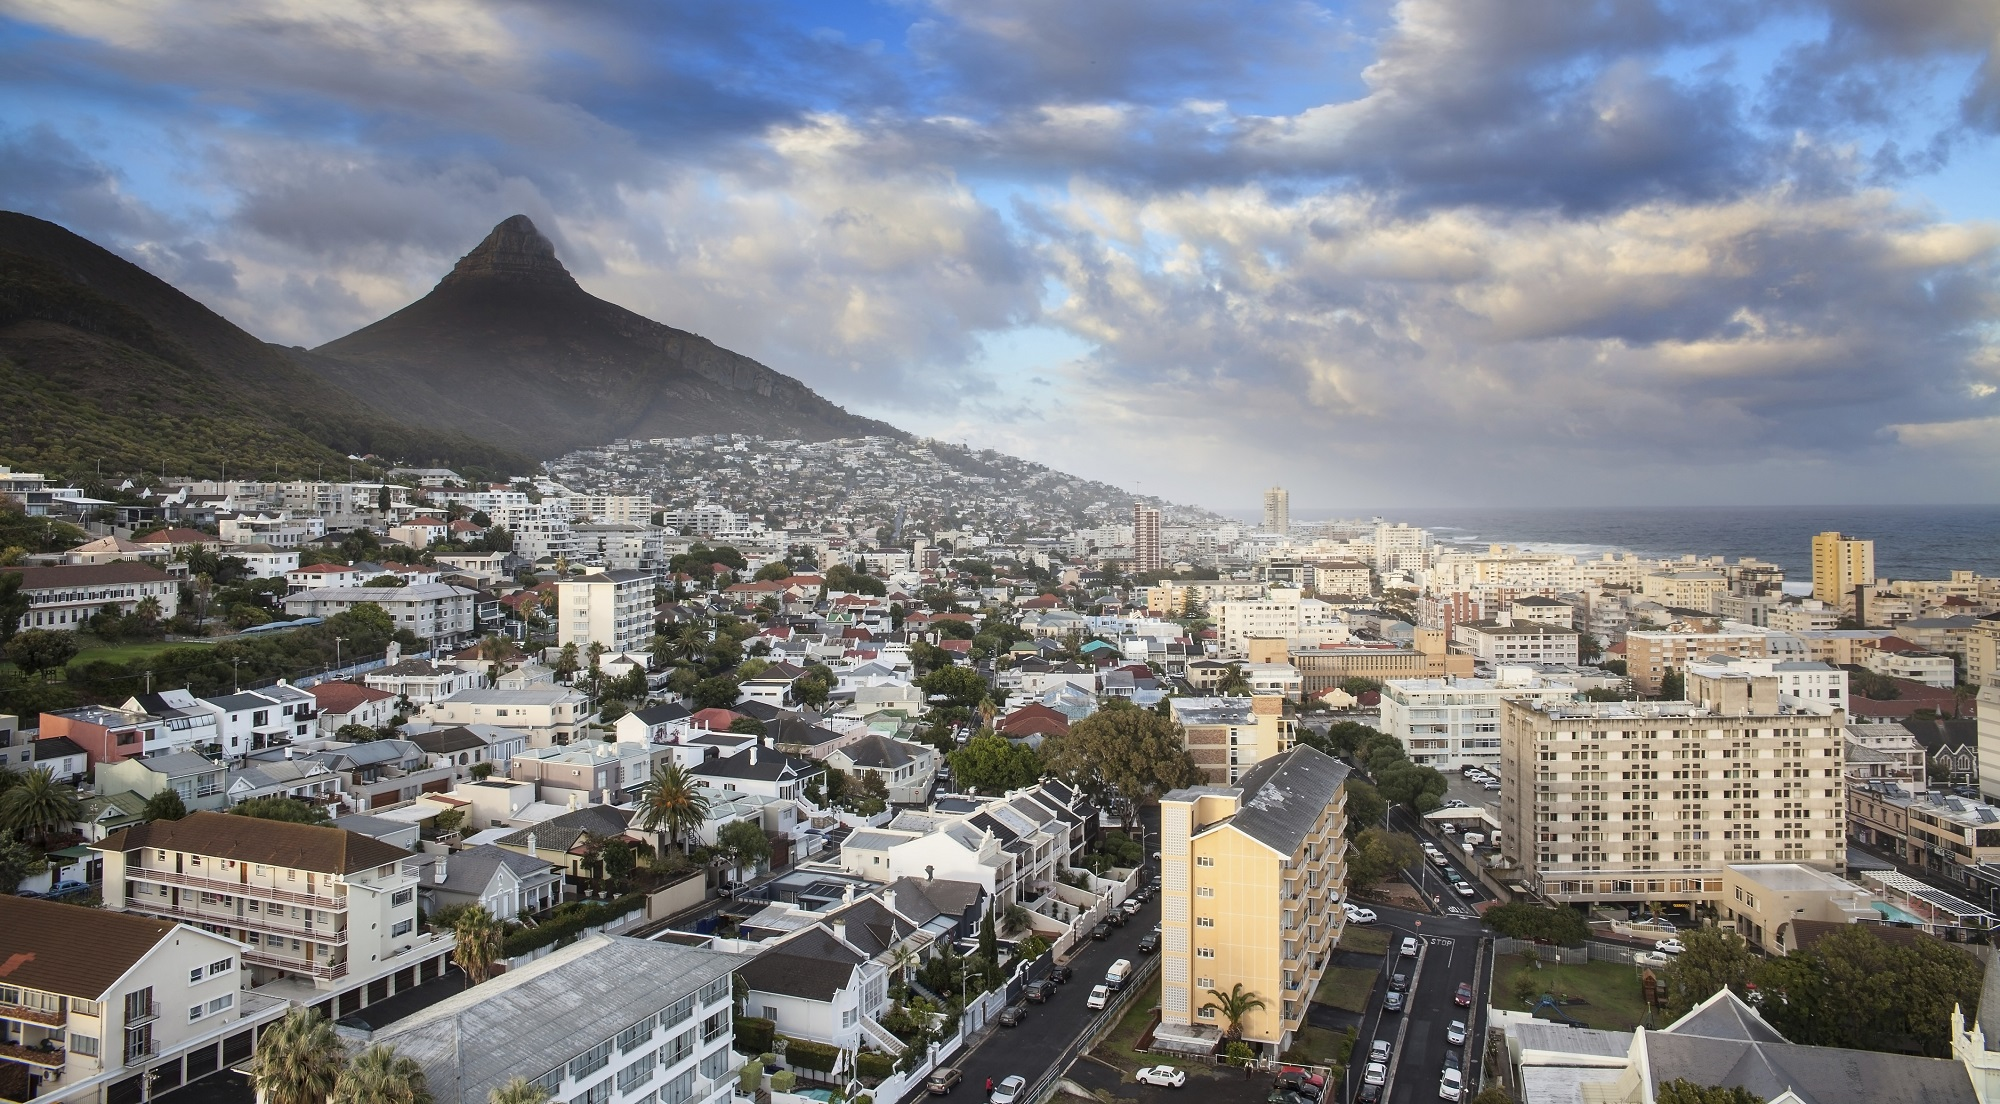 City of Cape Town chooses Landis+Gyr Sym2 metering solution